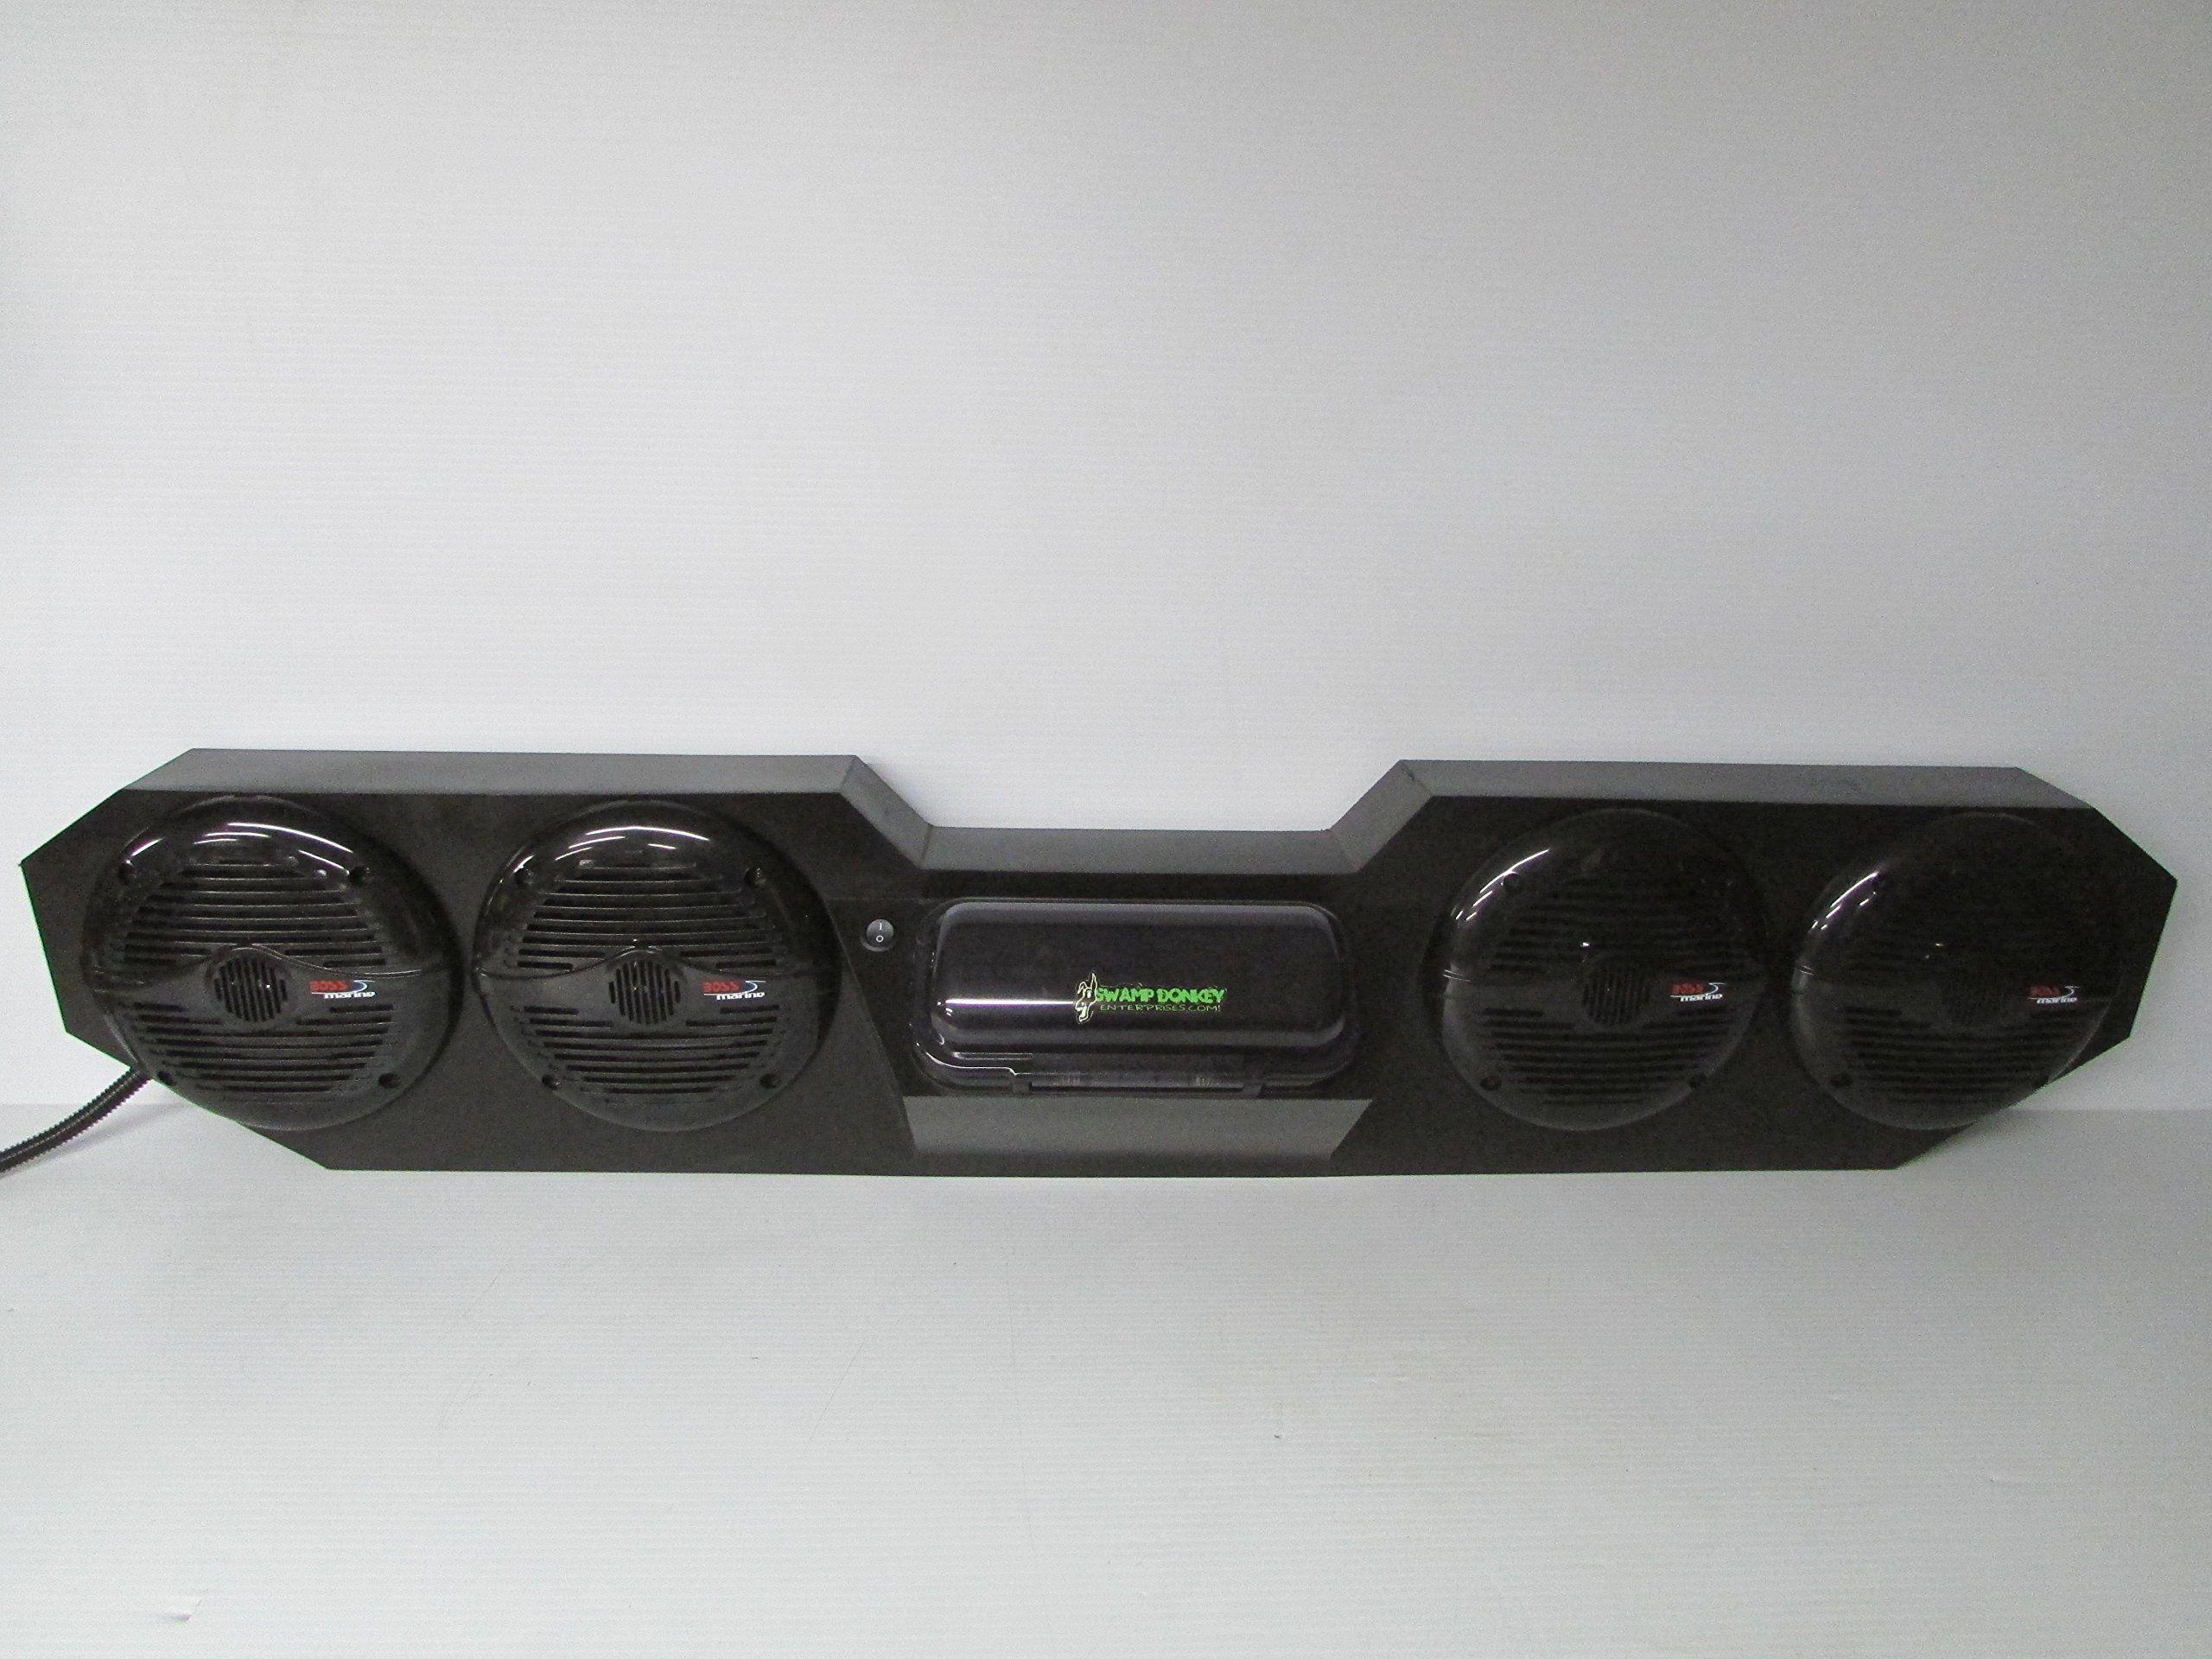 sd 2typibbt4b kawasaki teryx 2 seat honda pioneer 700 only sd 2typibbt4b kawasaki teryx 2 seat honda pioneer 700 only stereo system utv side